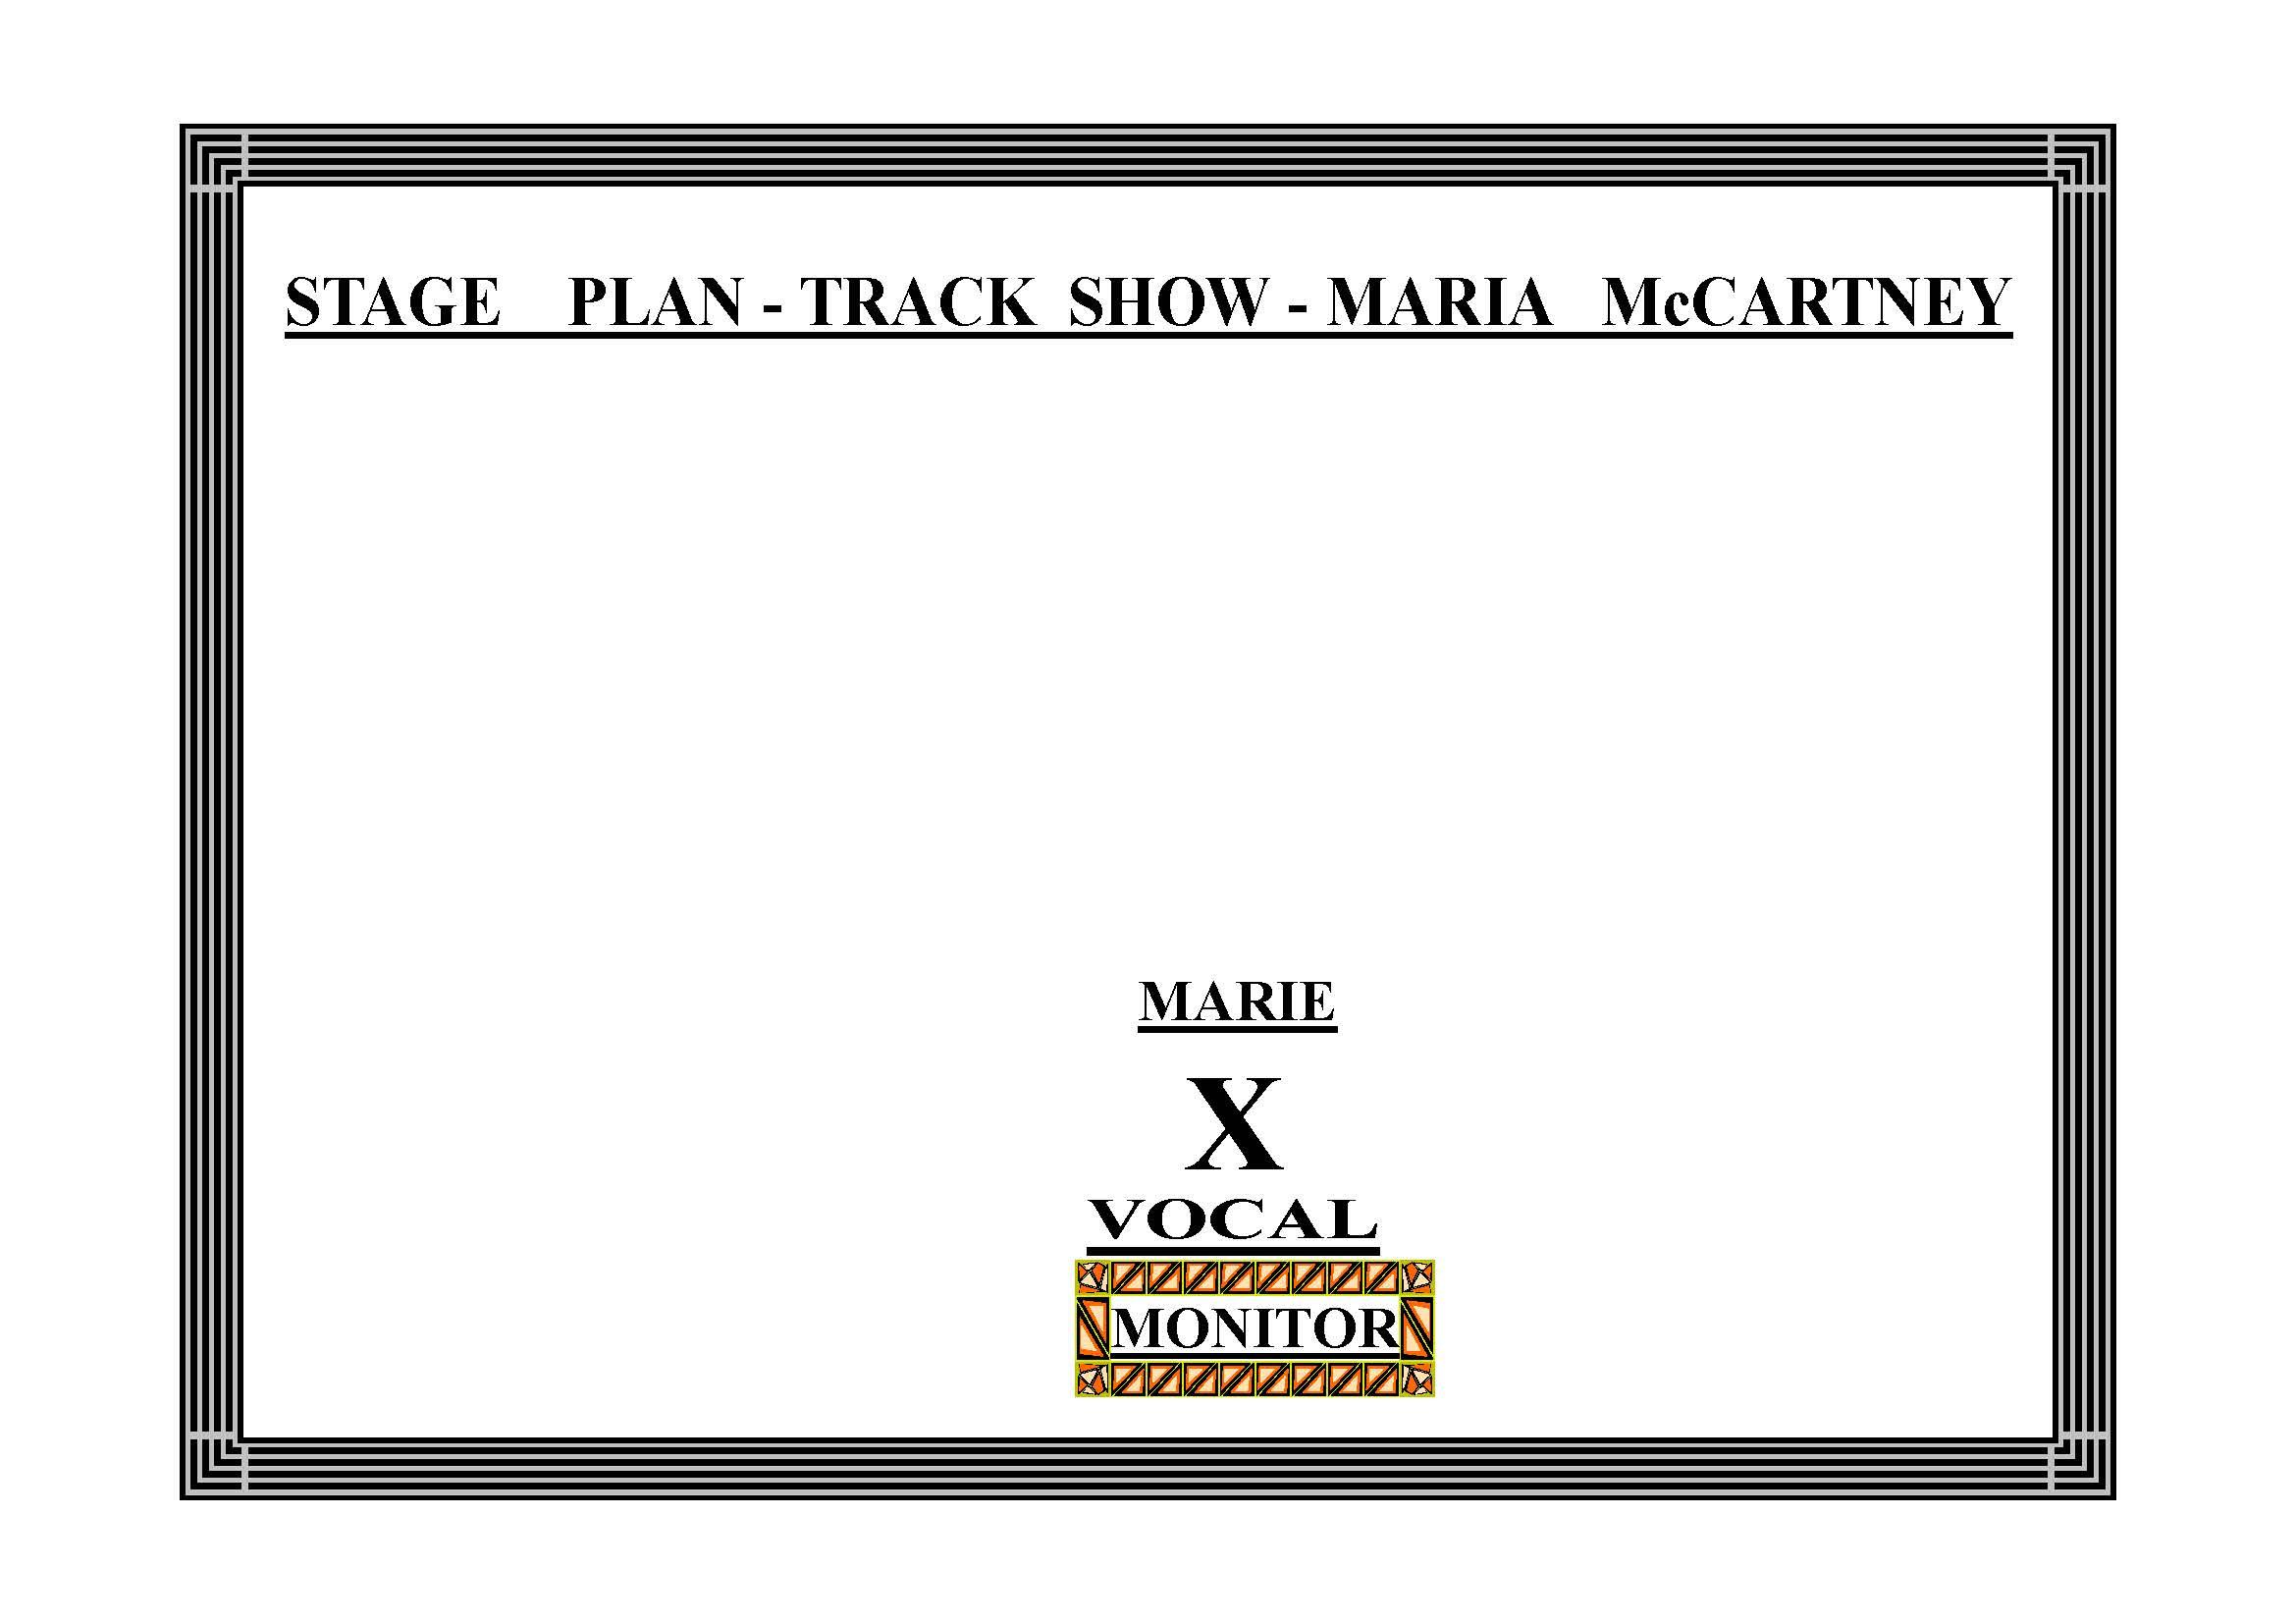 MARIA mCCARTNEY STAGE PLAN - TRACK SHOW - 1